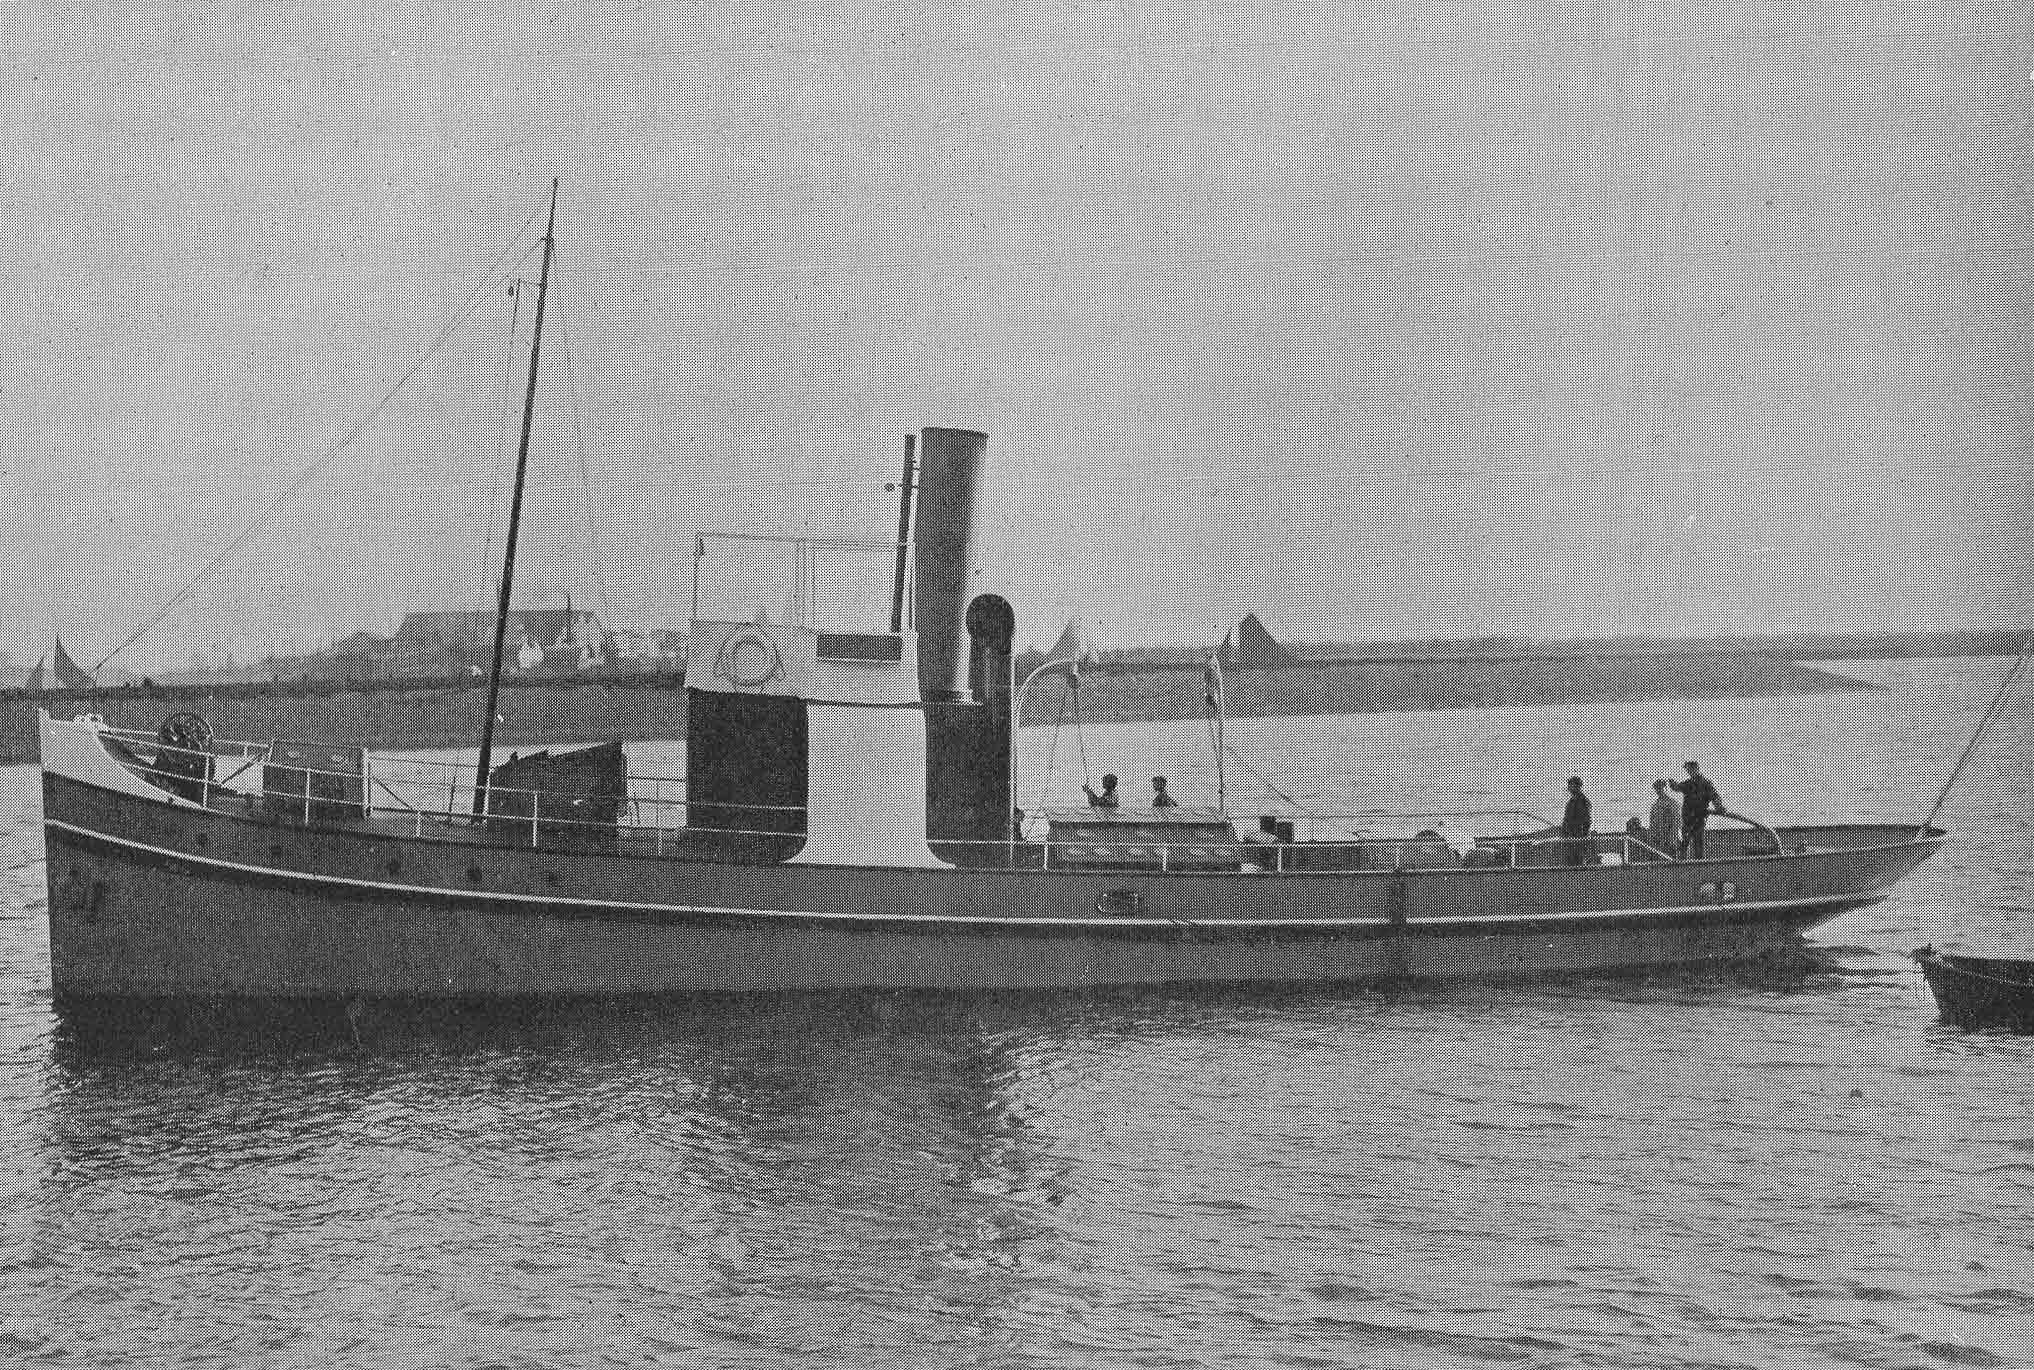 Bnr. 335: Sedjoumi (1907)